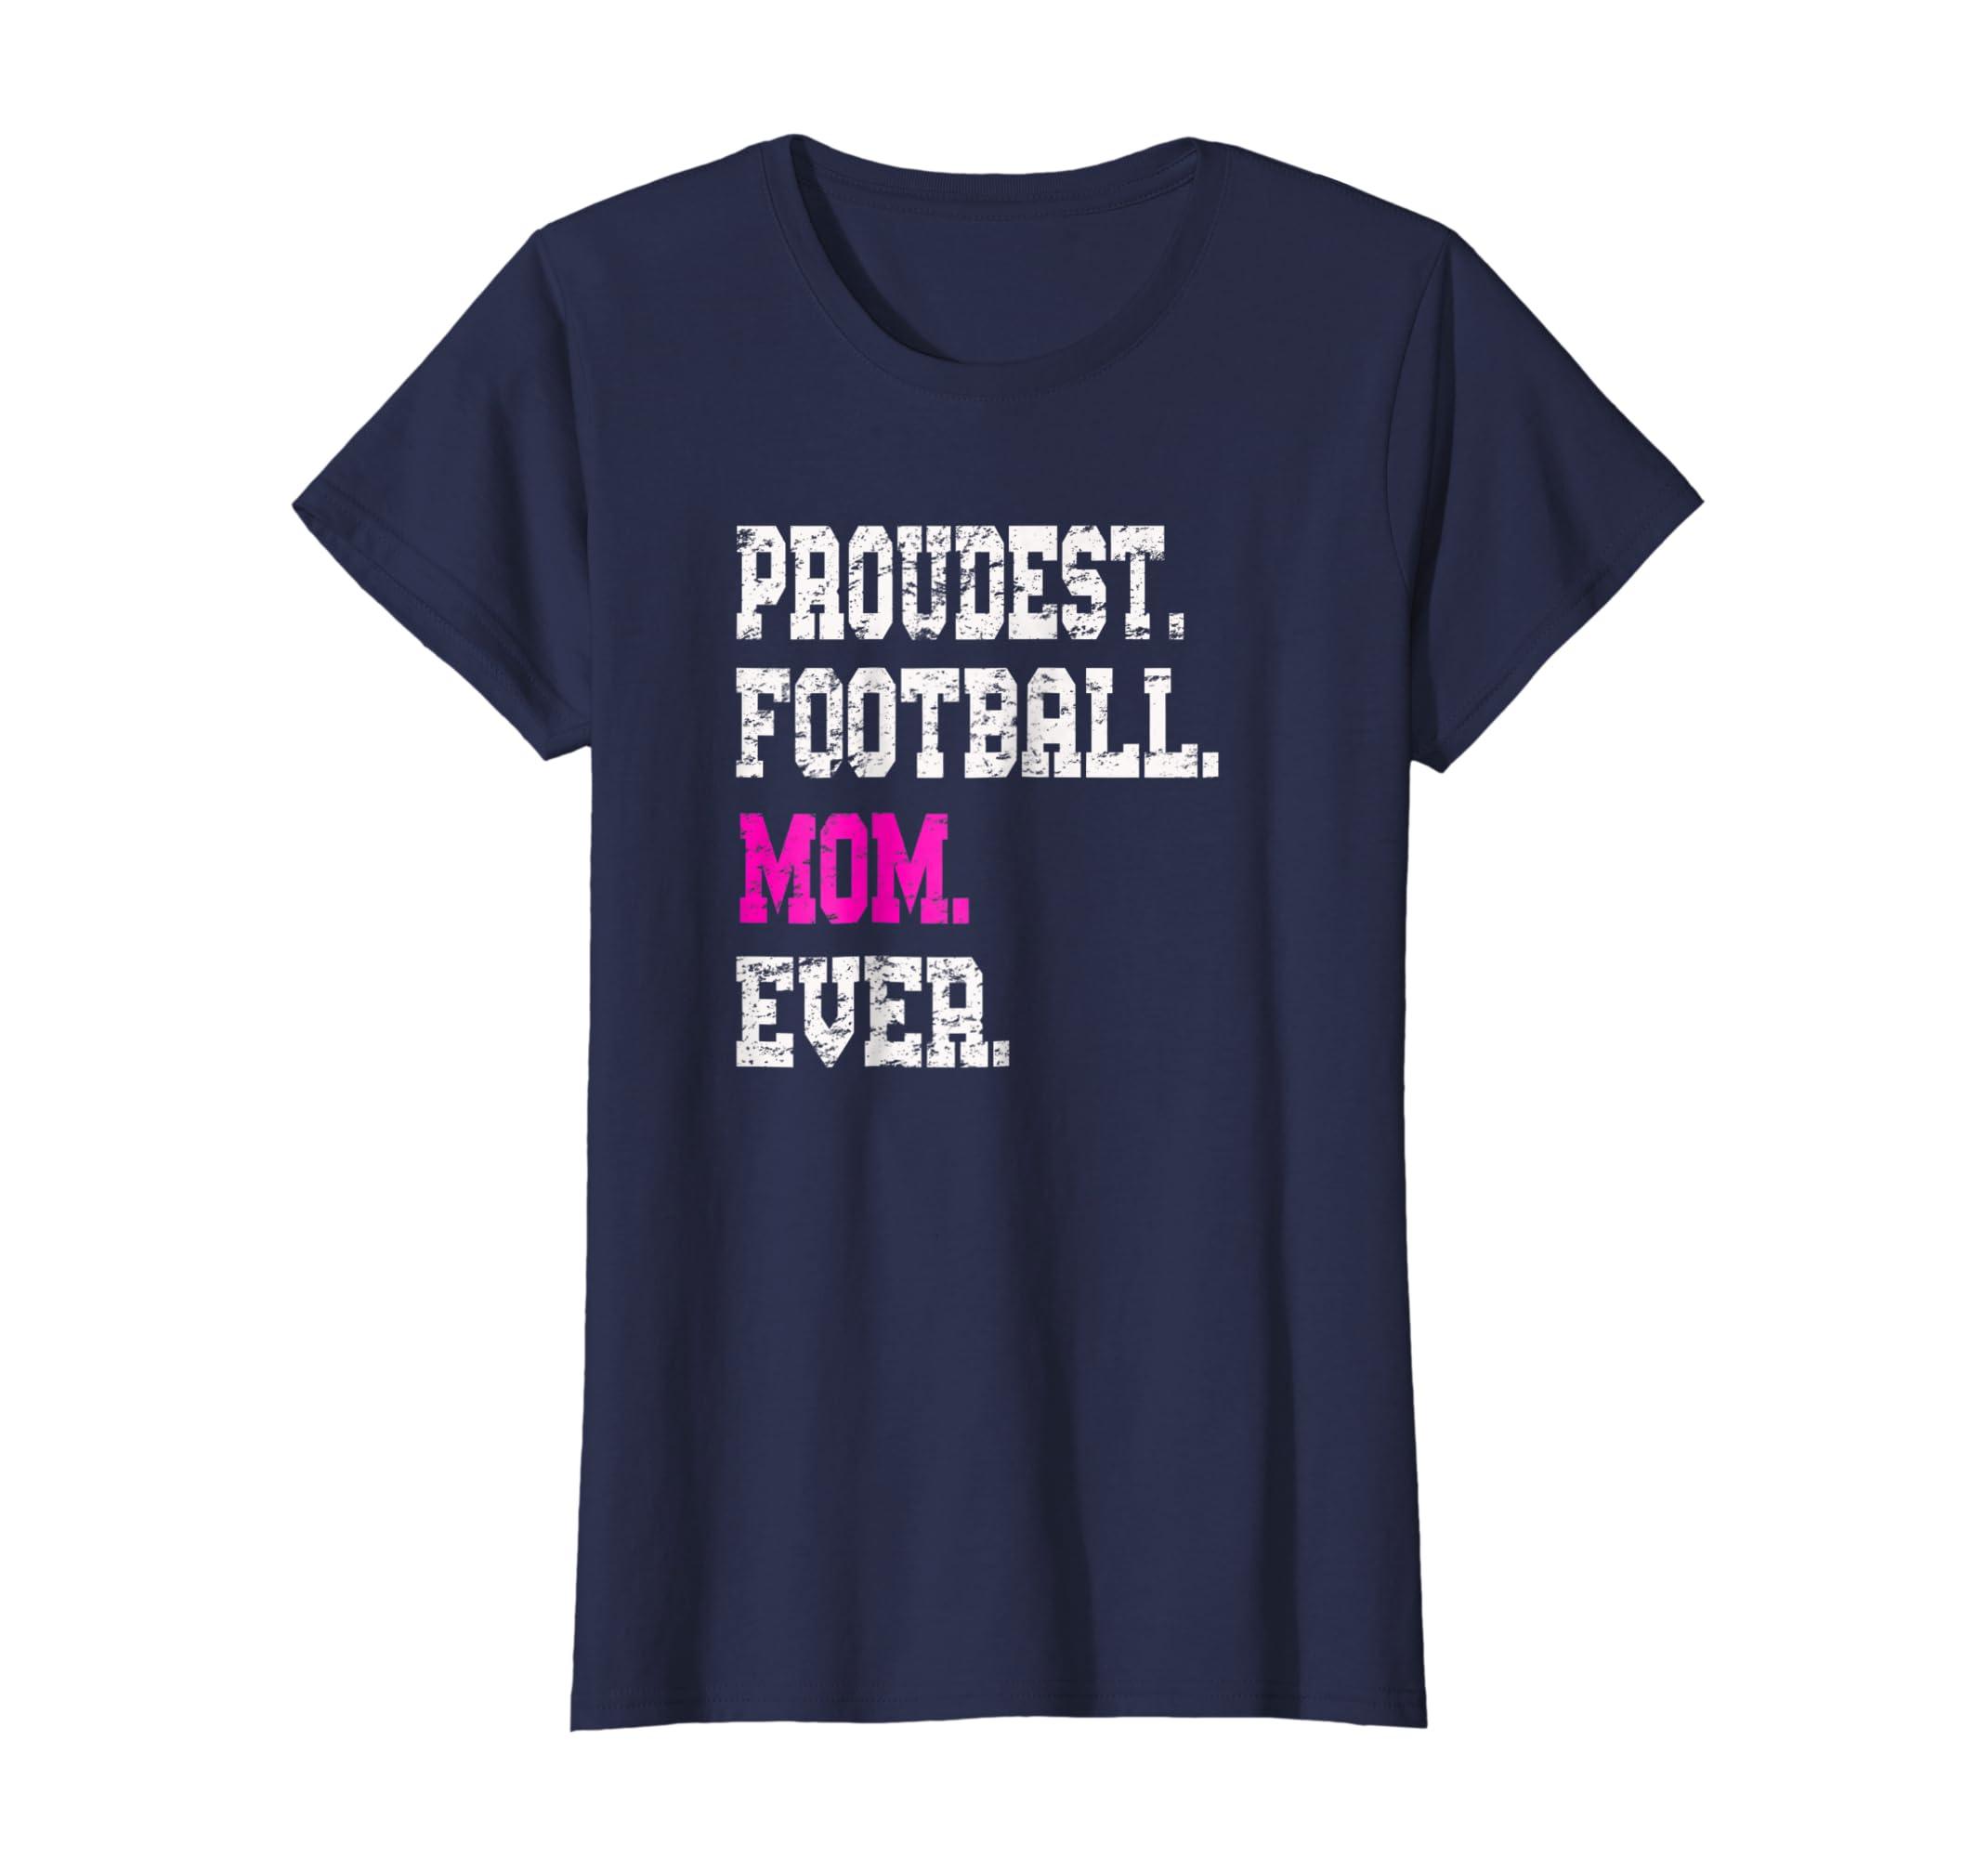 c030365f6d8a Amazon.com  Football Mom Shirt